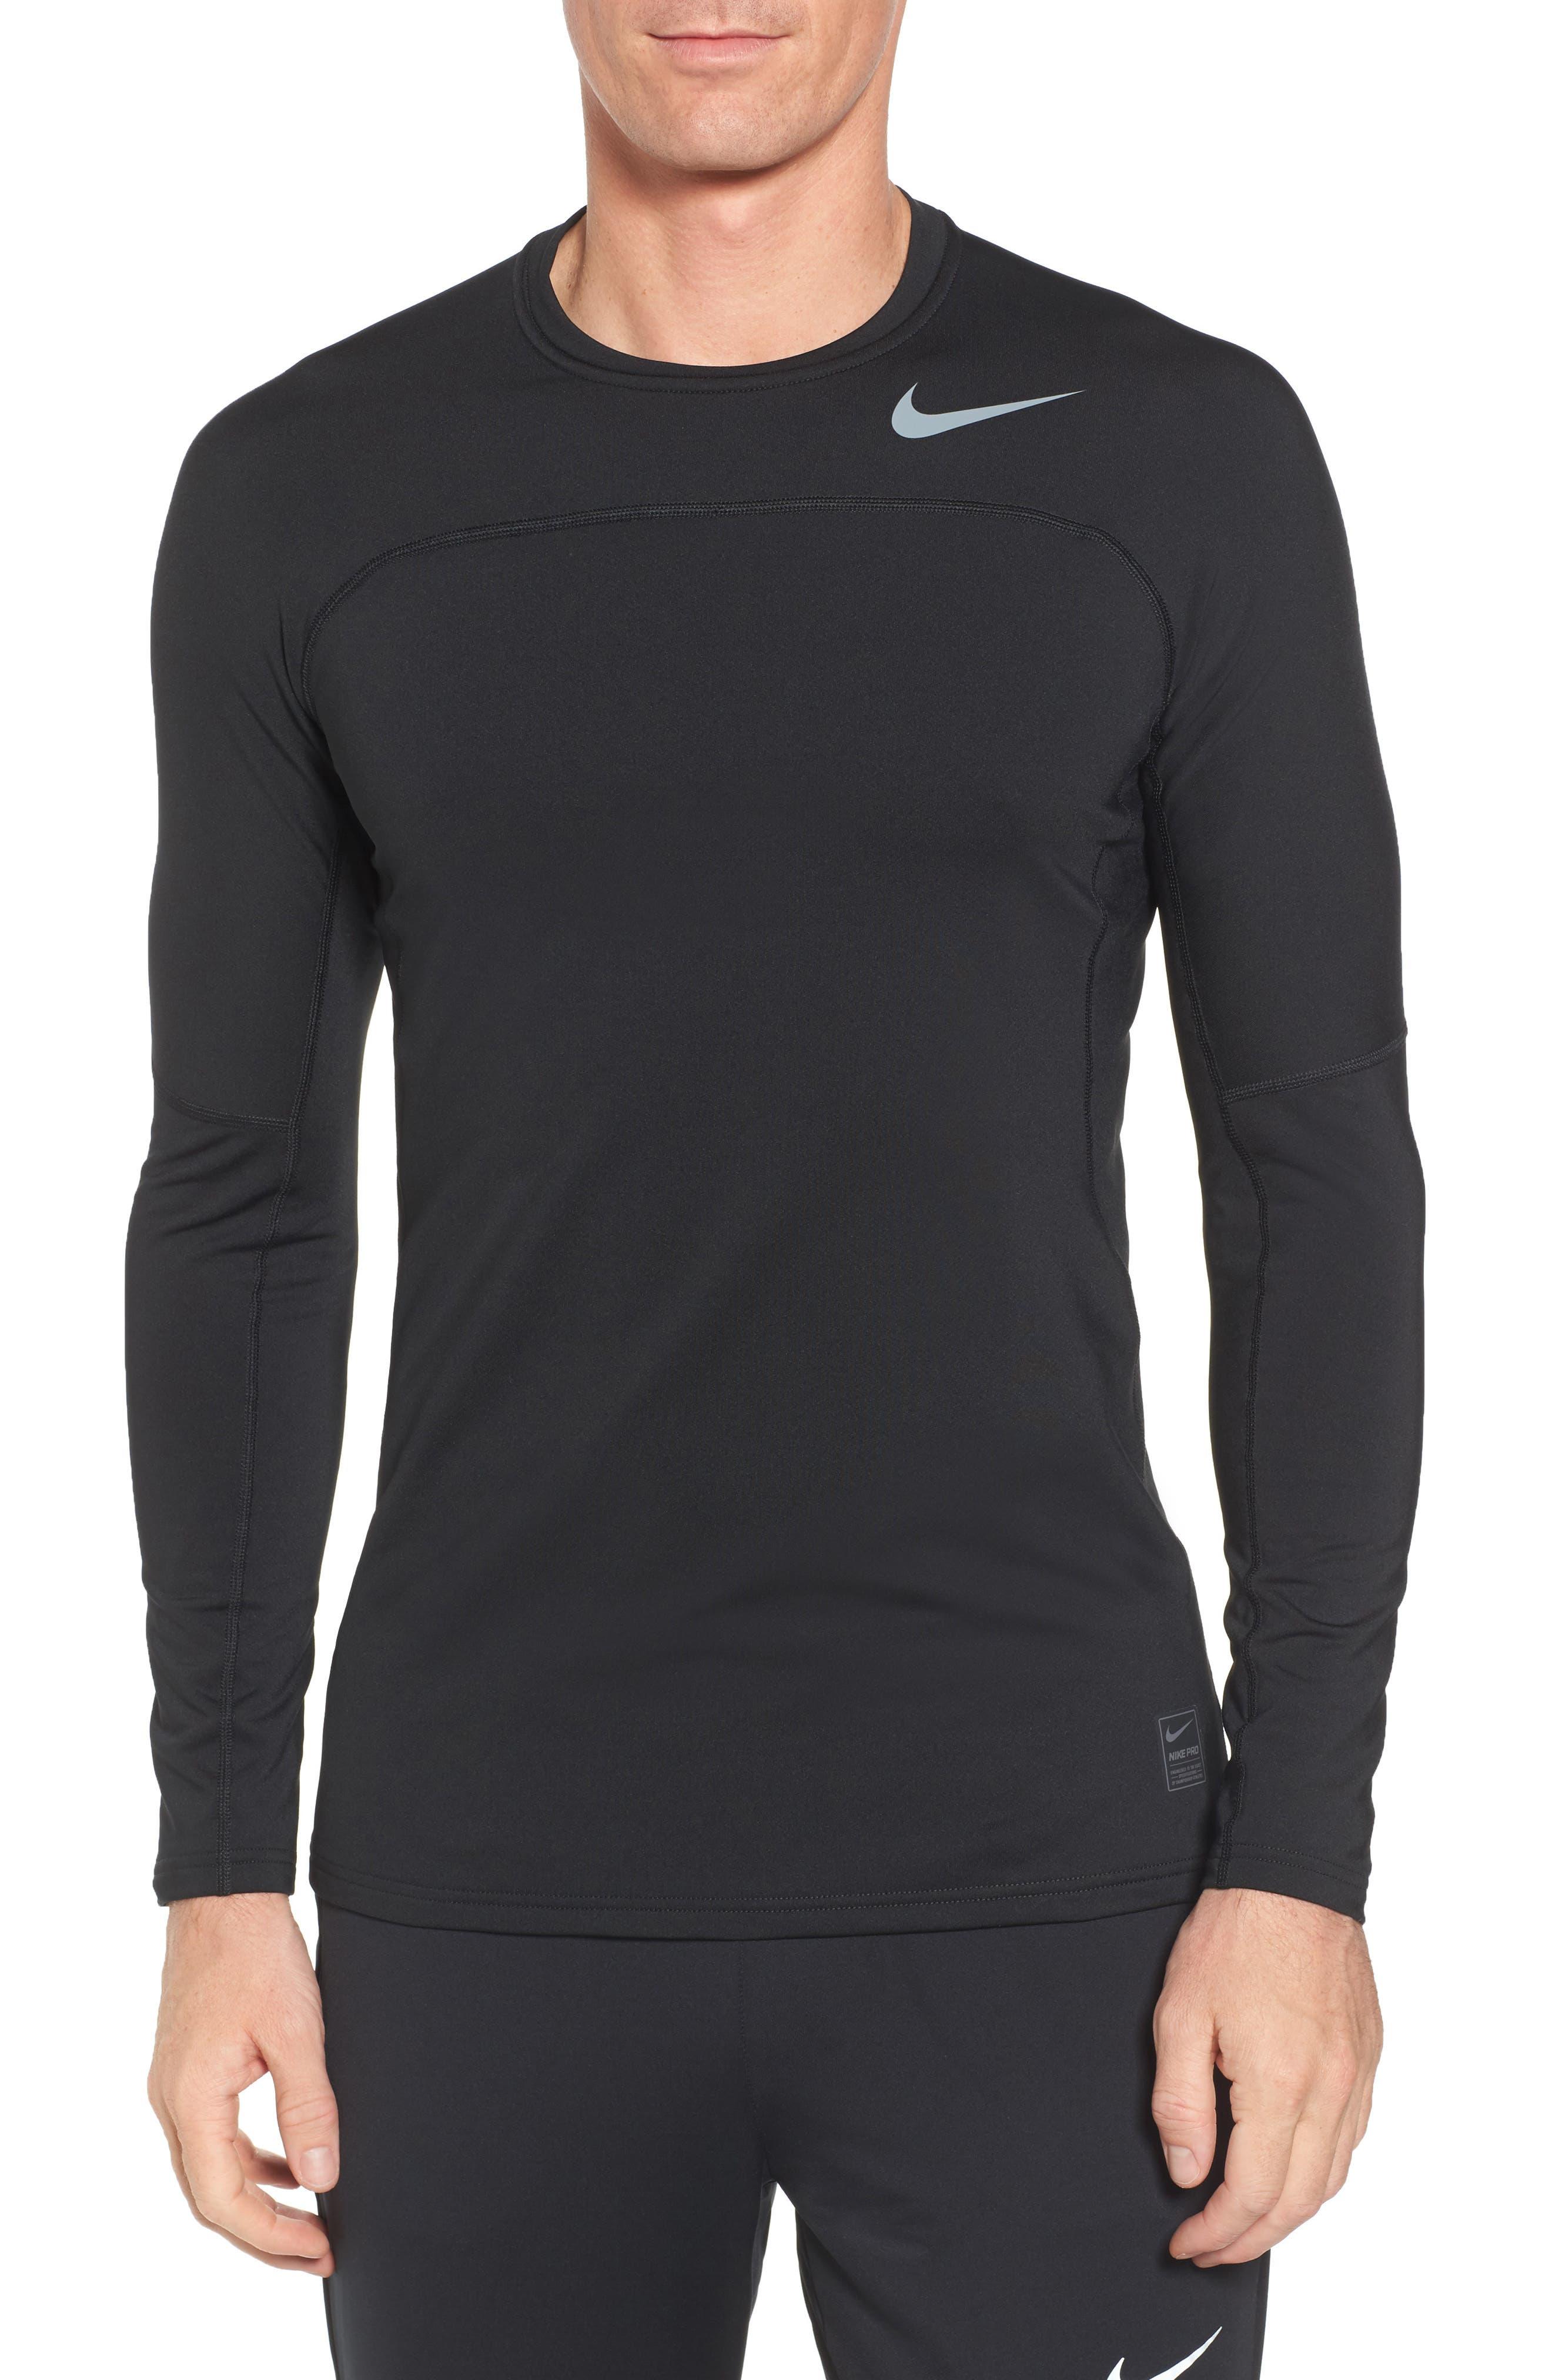 Pro Long Sleeve Training T-Shirt,                         Main,                         color, Black/ Cool Grey/ Cool Grey